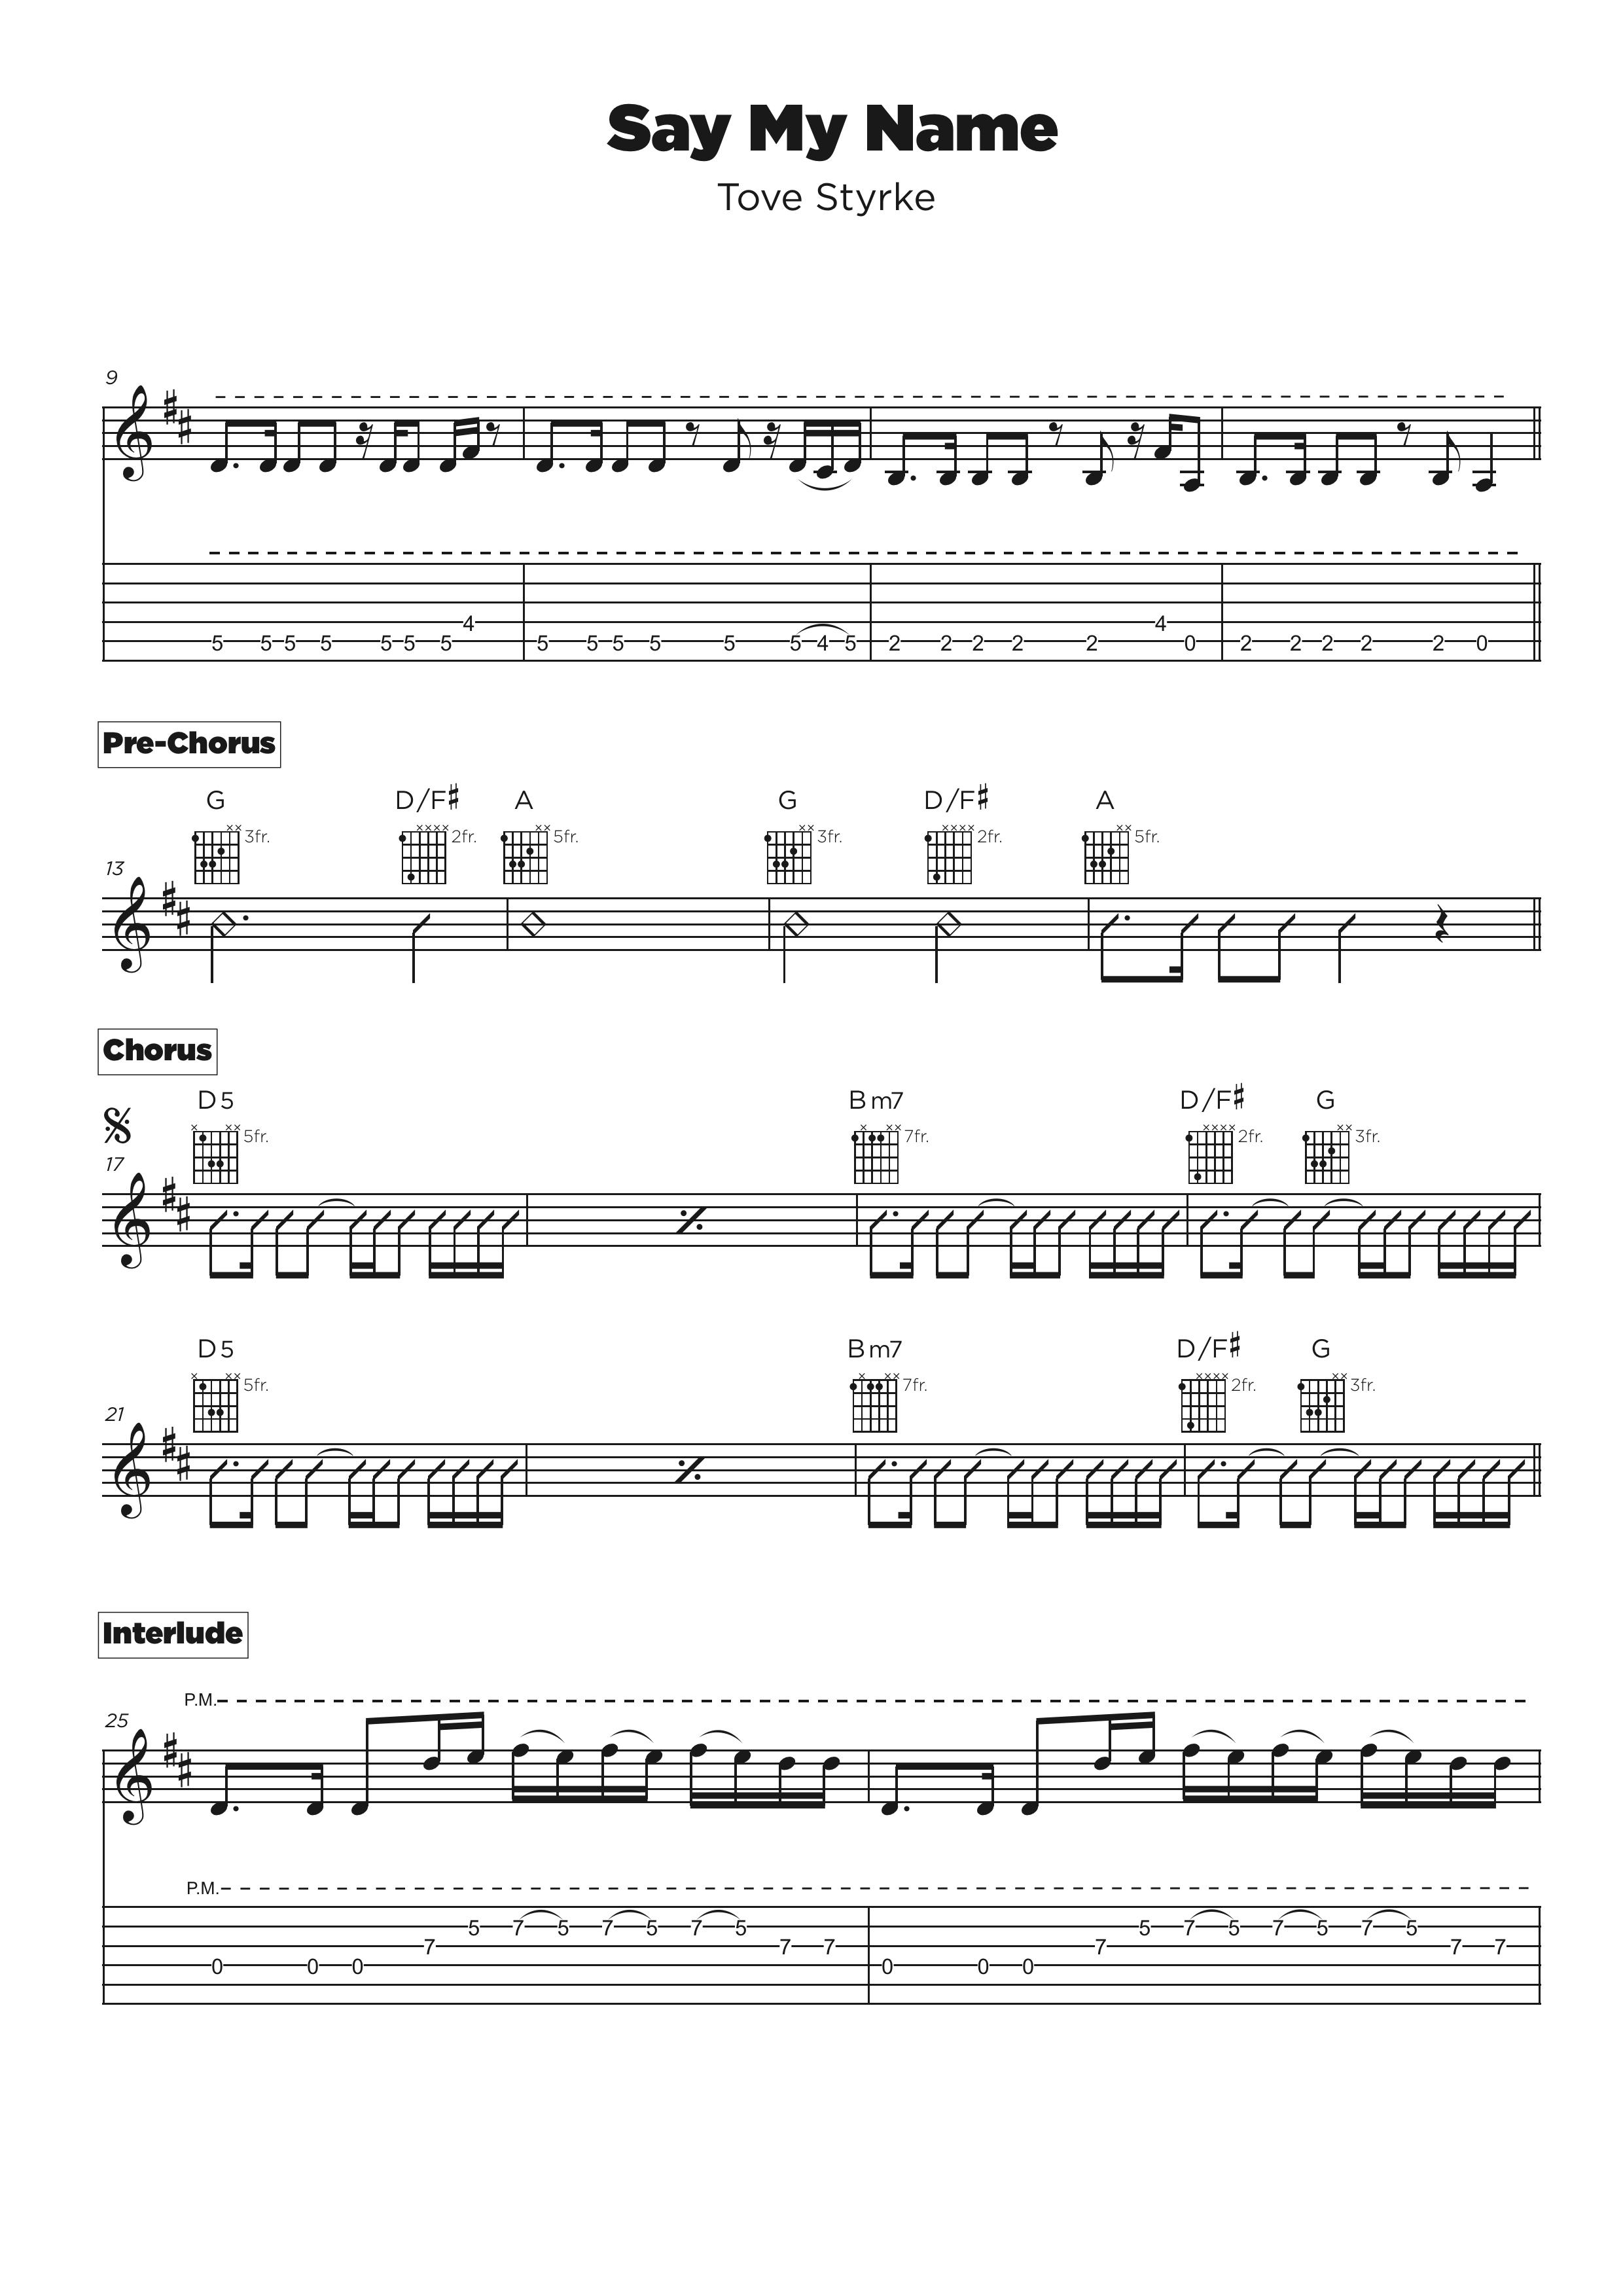 Guitar tab transcription service - slash example